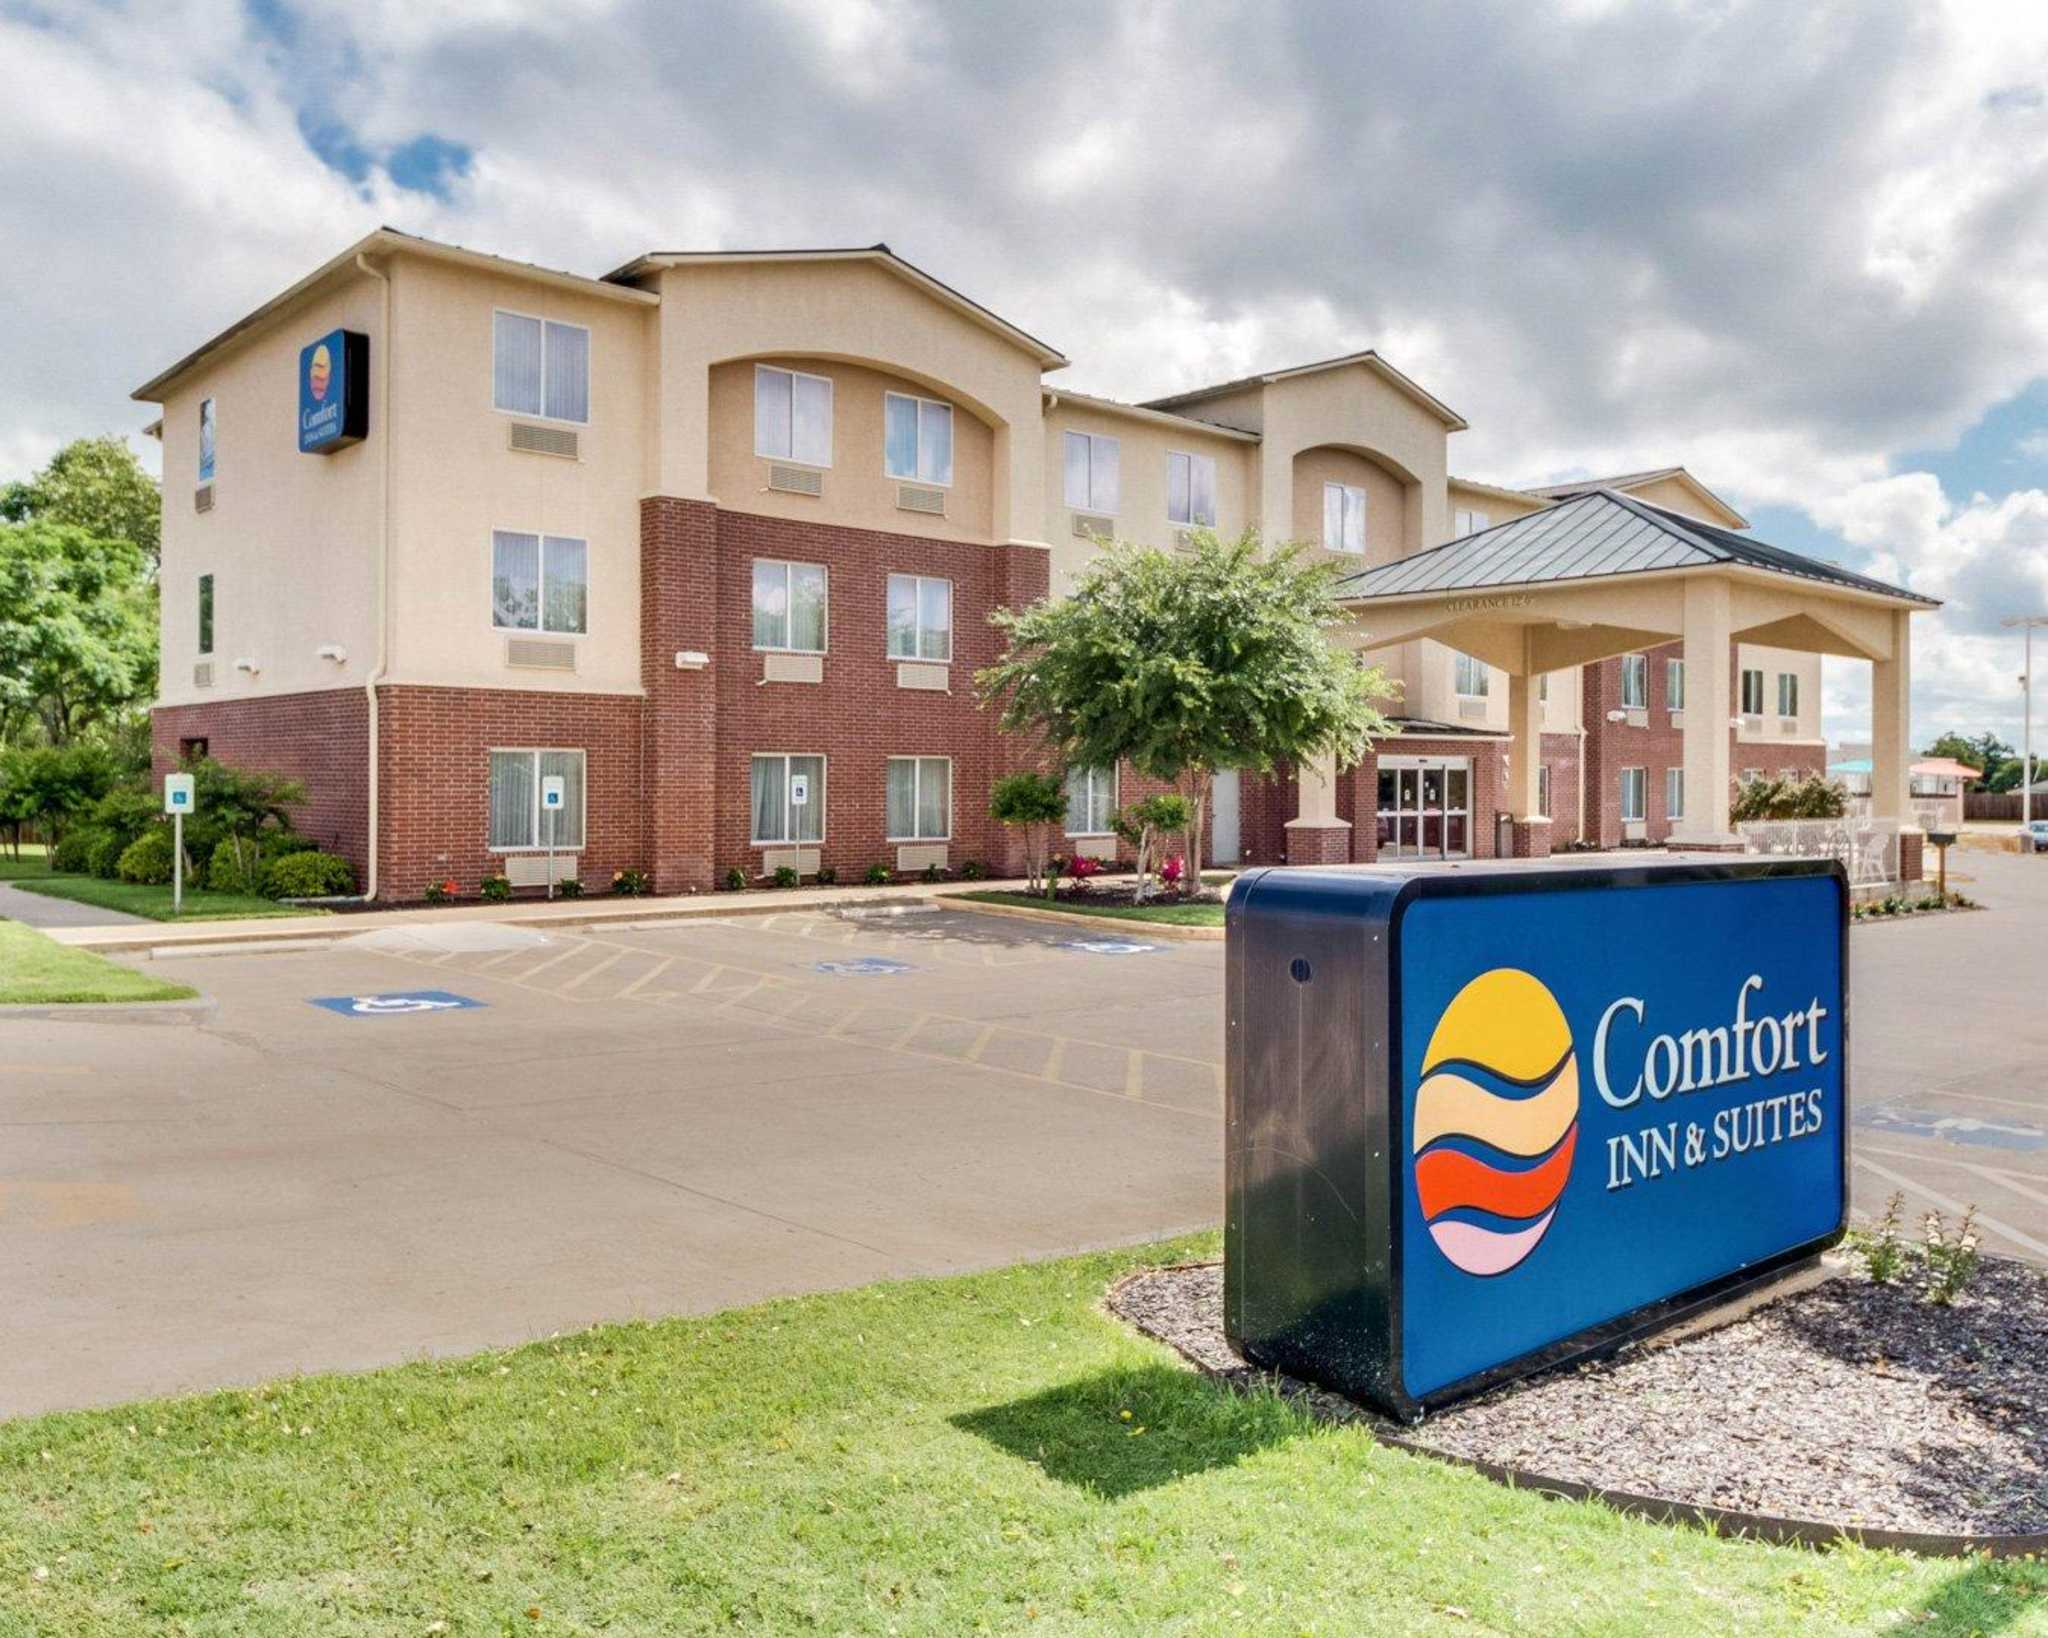 Comfort Inn & Suites - Fredericksburg, TX - Business ...